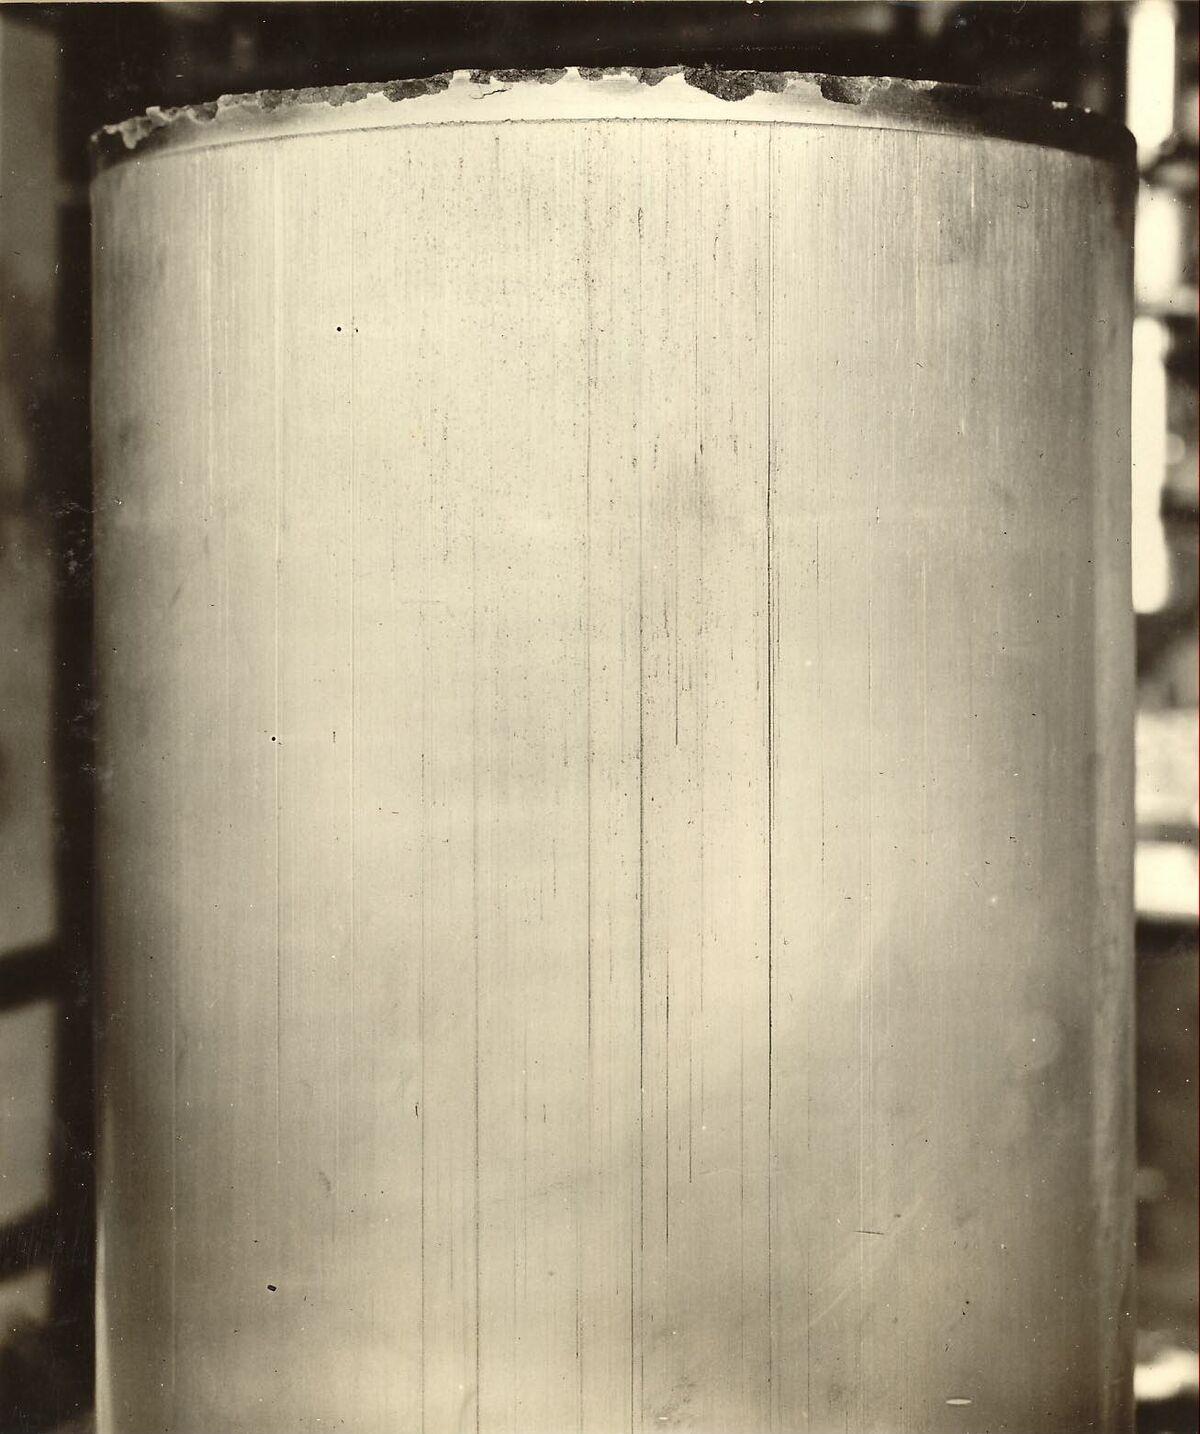 GFA 24/53.1181: Nicholls moulding machine